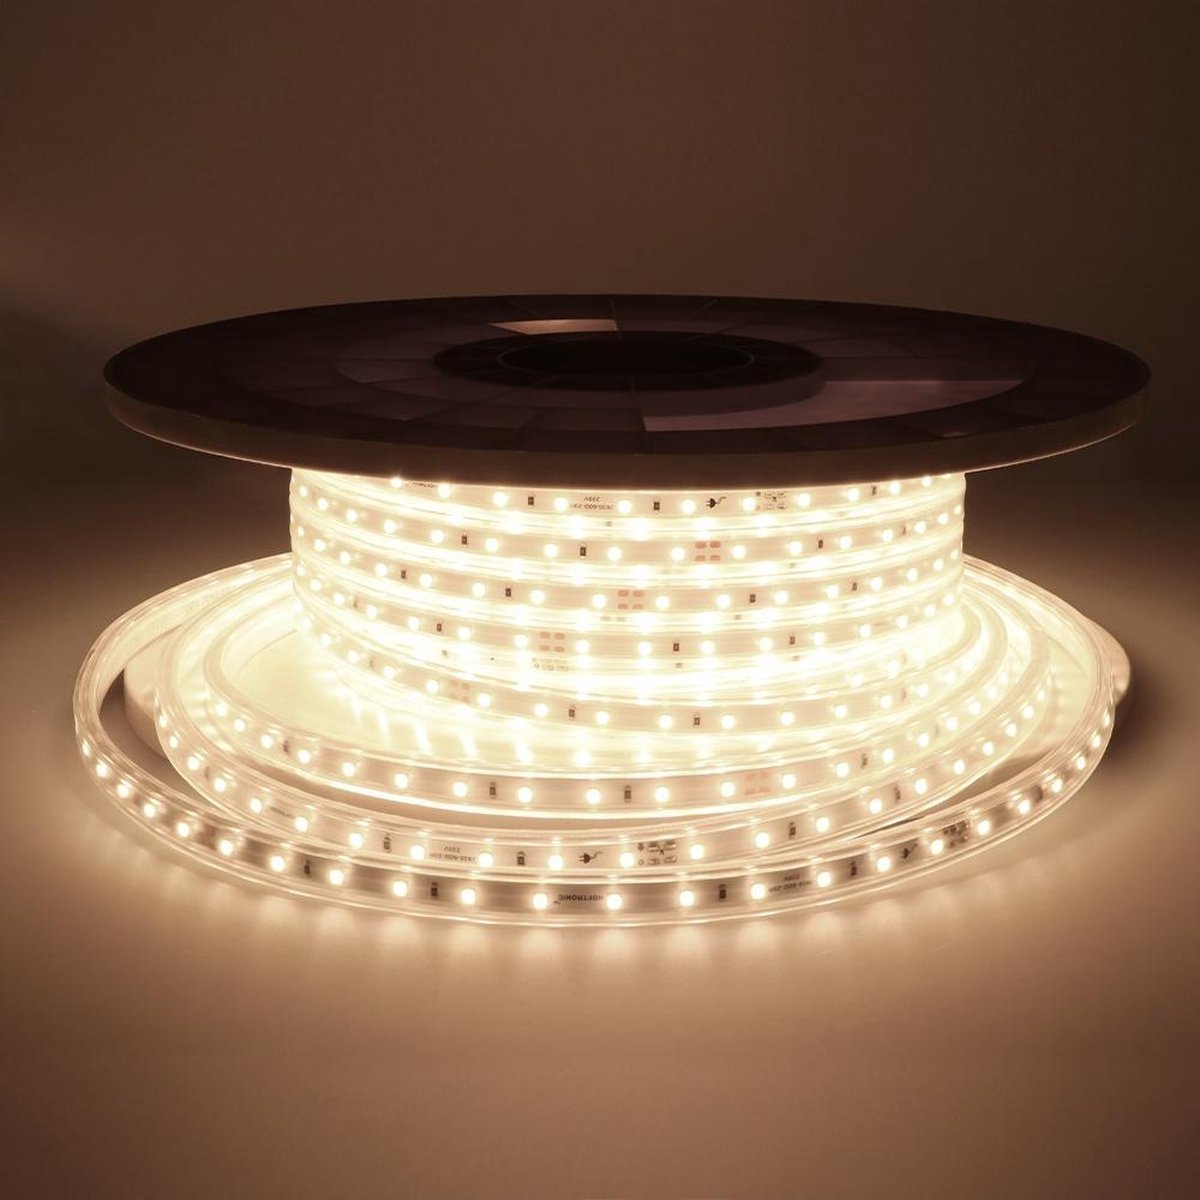 Dimbare LED Strip 25m 4000K 60 LEDs/m IP65 Plug & Play - Flex60 Series